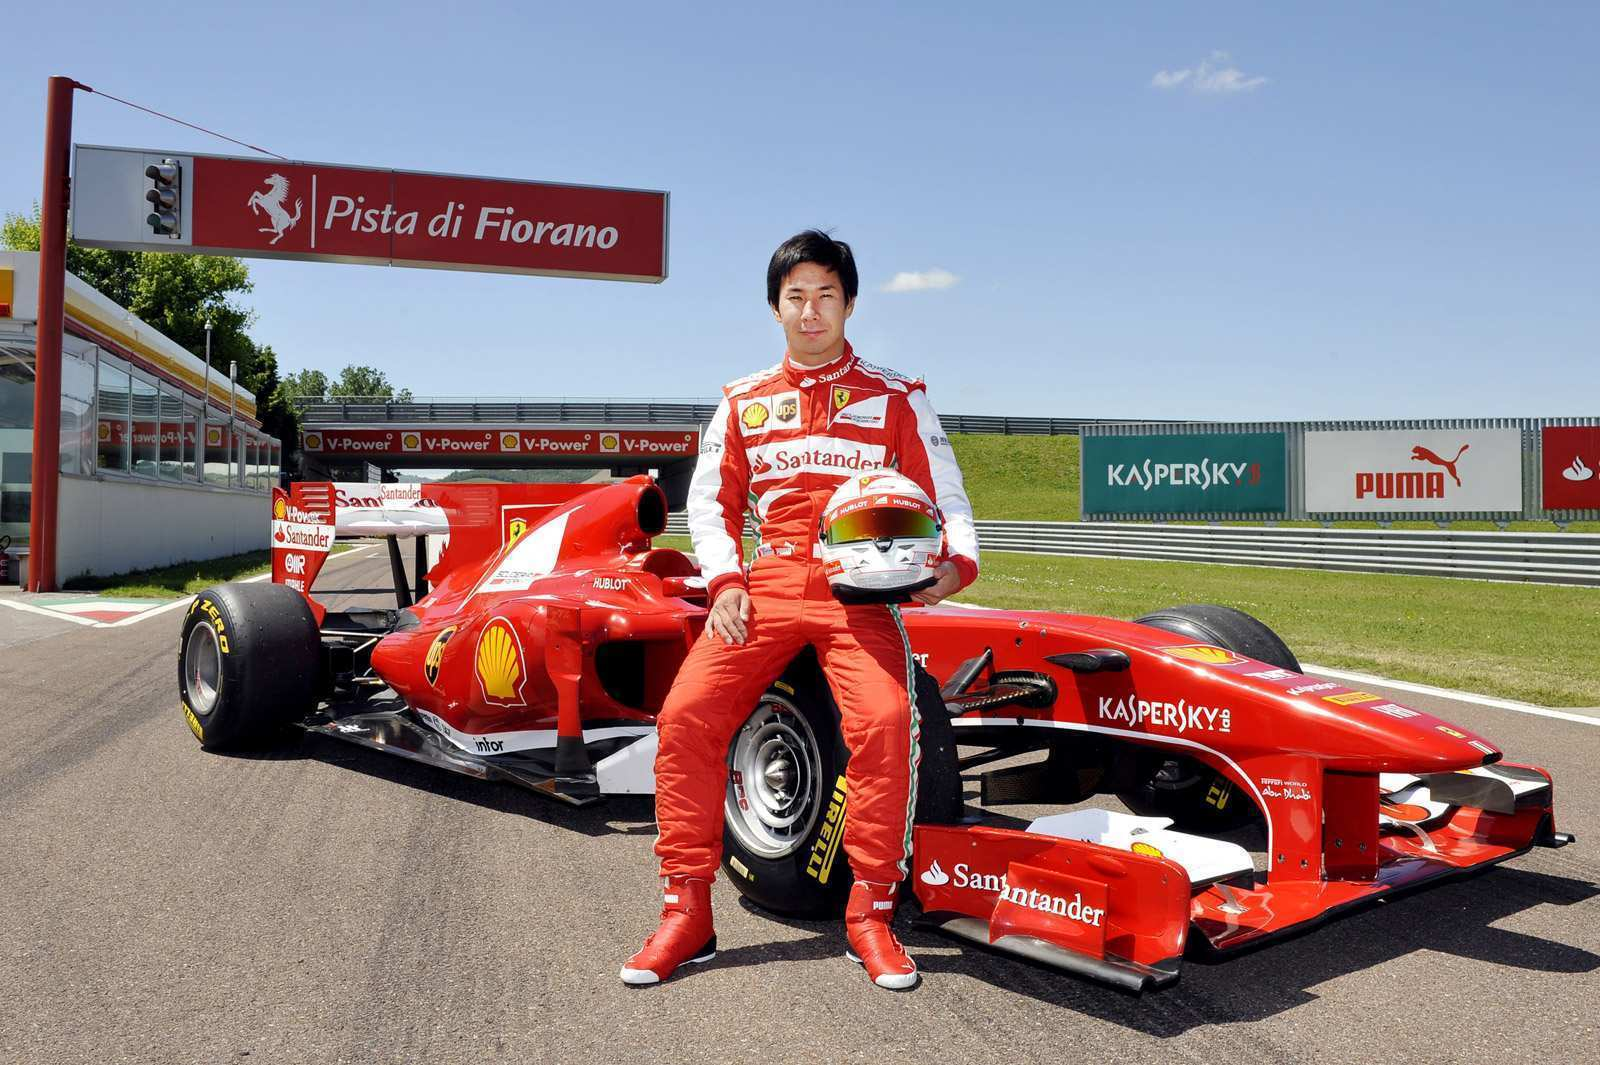 94 Gallery of 2019 Ferrari F1 Drivers Exterior with 2019 Ferrari F1 Drivers